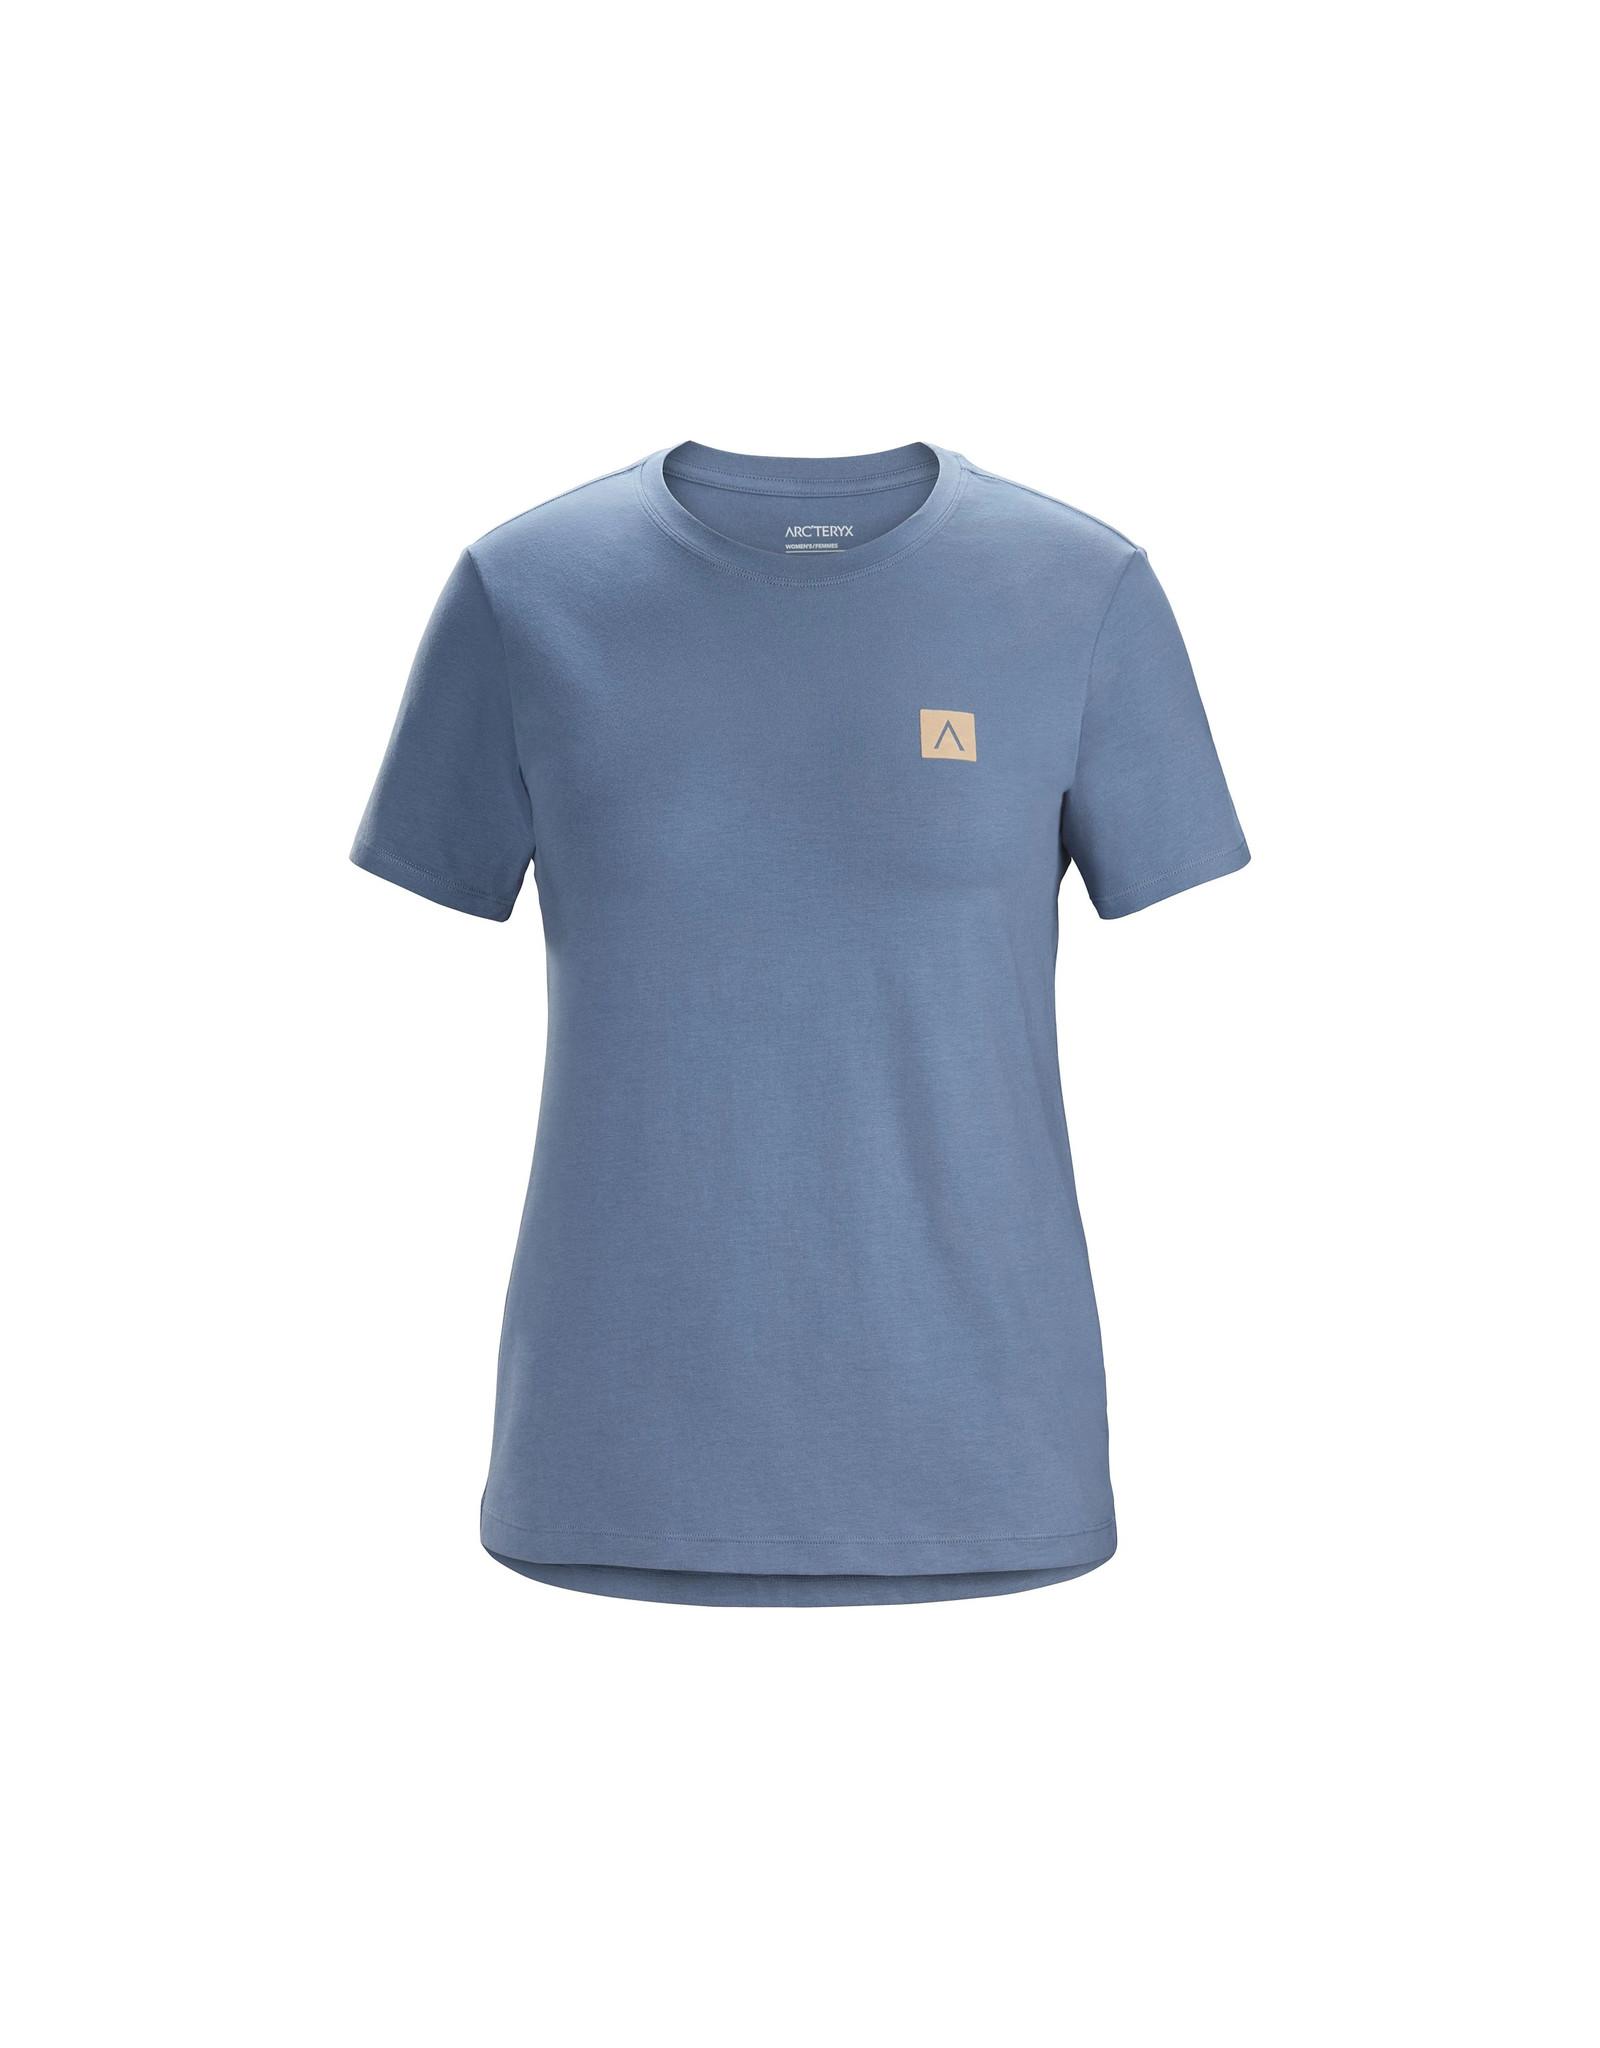 Arc'teryx T-Shirt Arc'teryx A Squared Femme